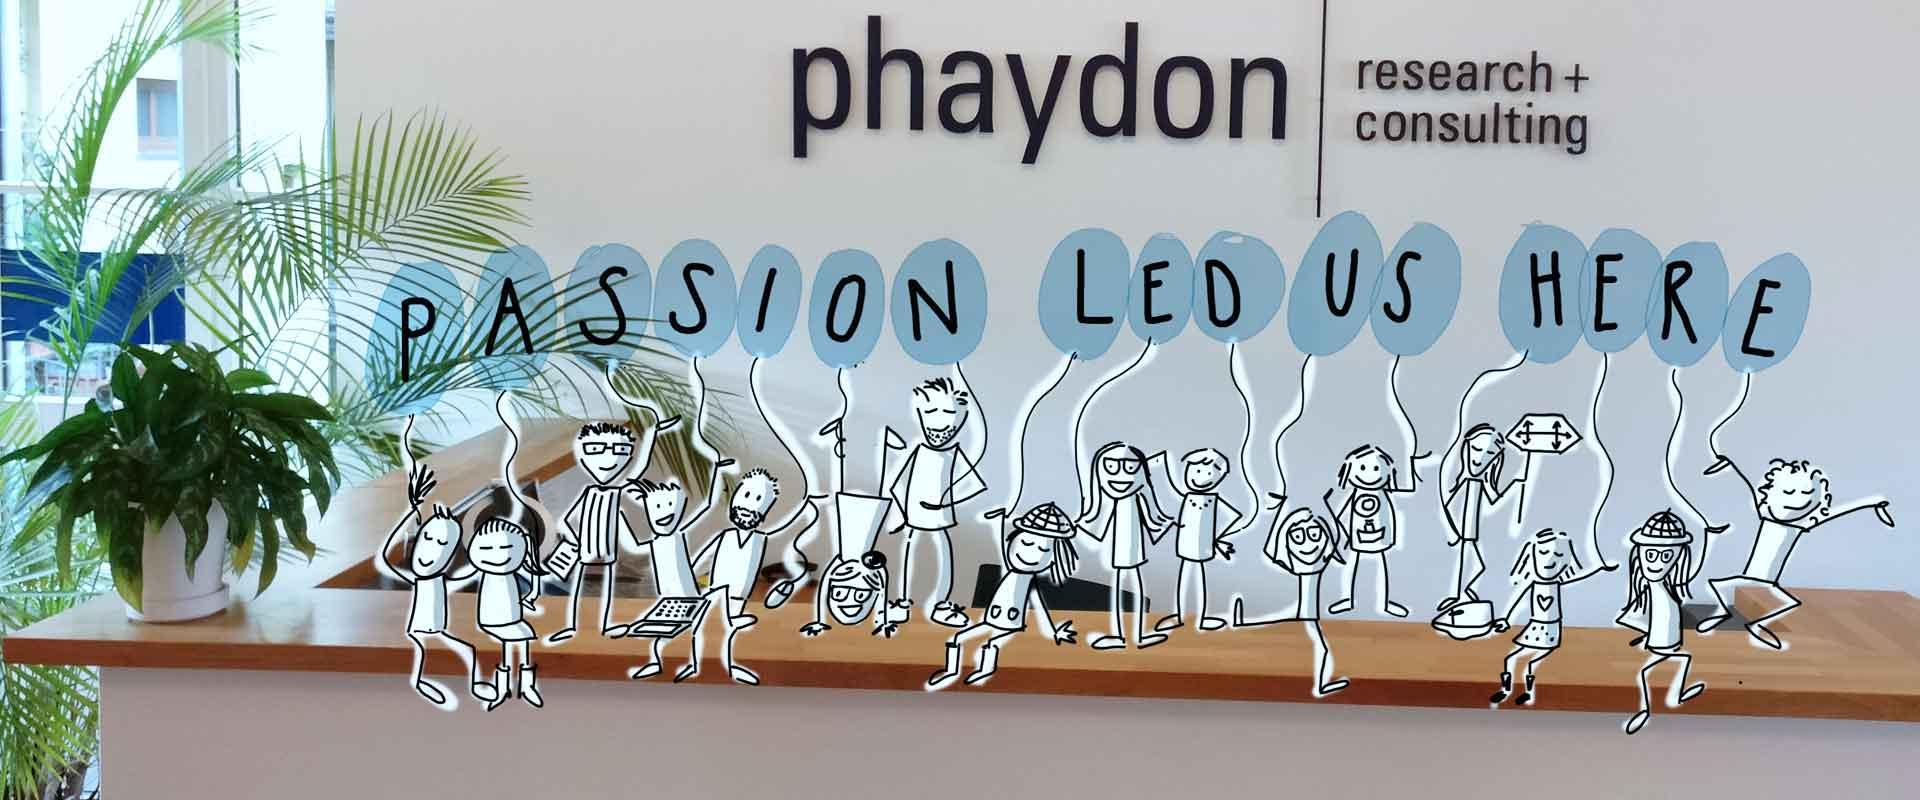 Sketchnote 'passion led us here' - Referenzen phaydon Marktforschung